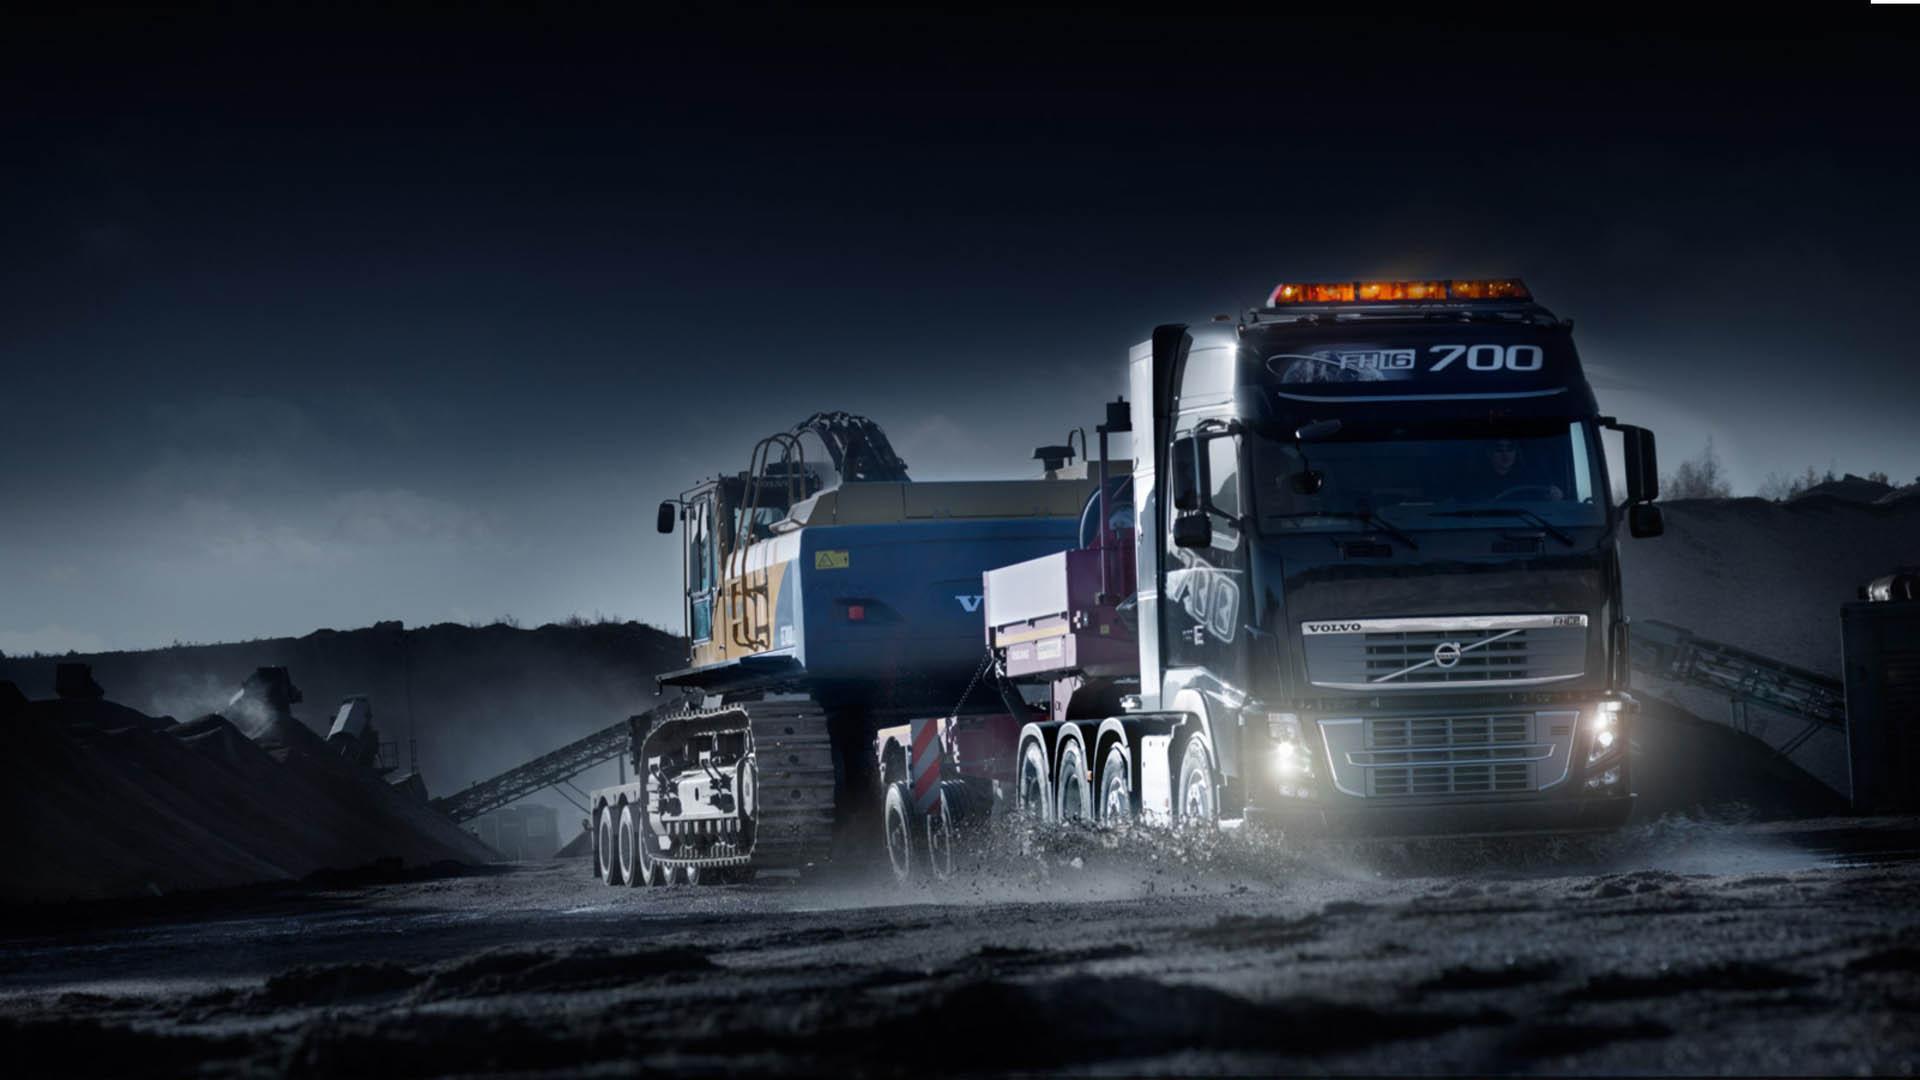 best truck wallpapers - photo #8